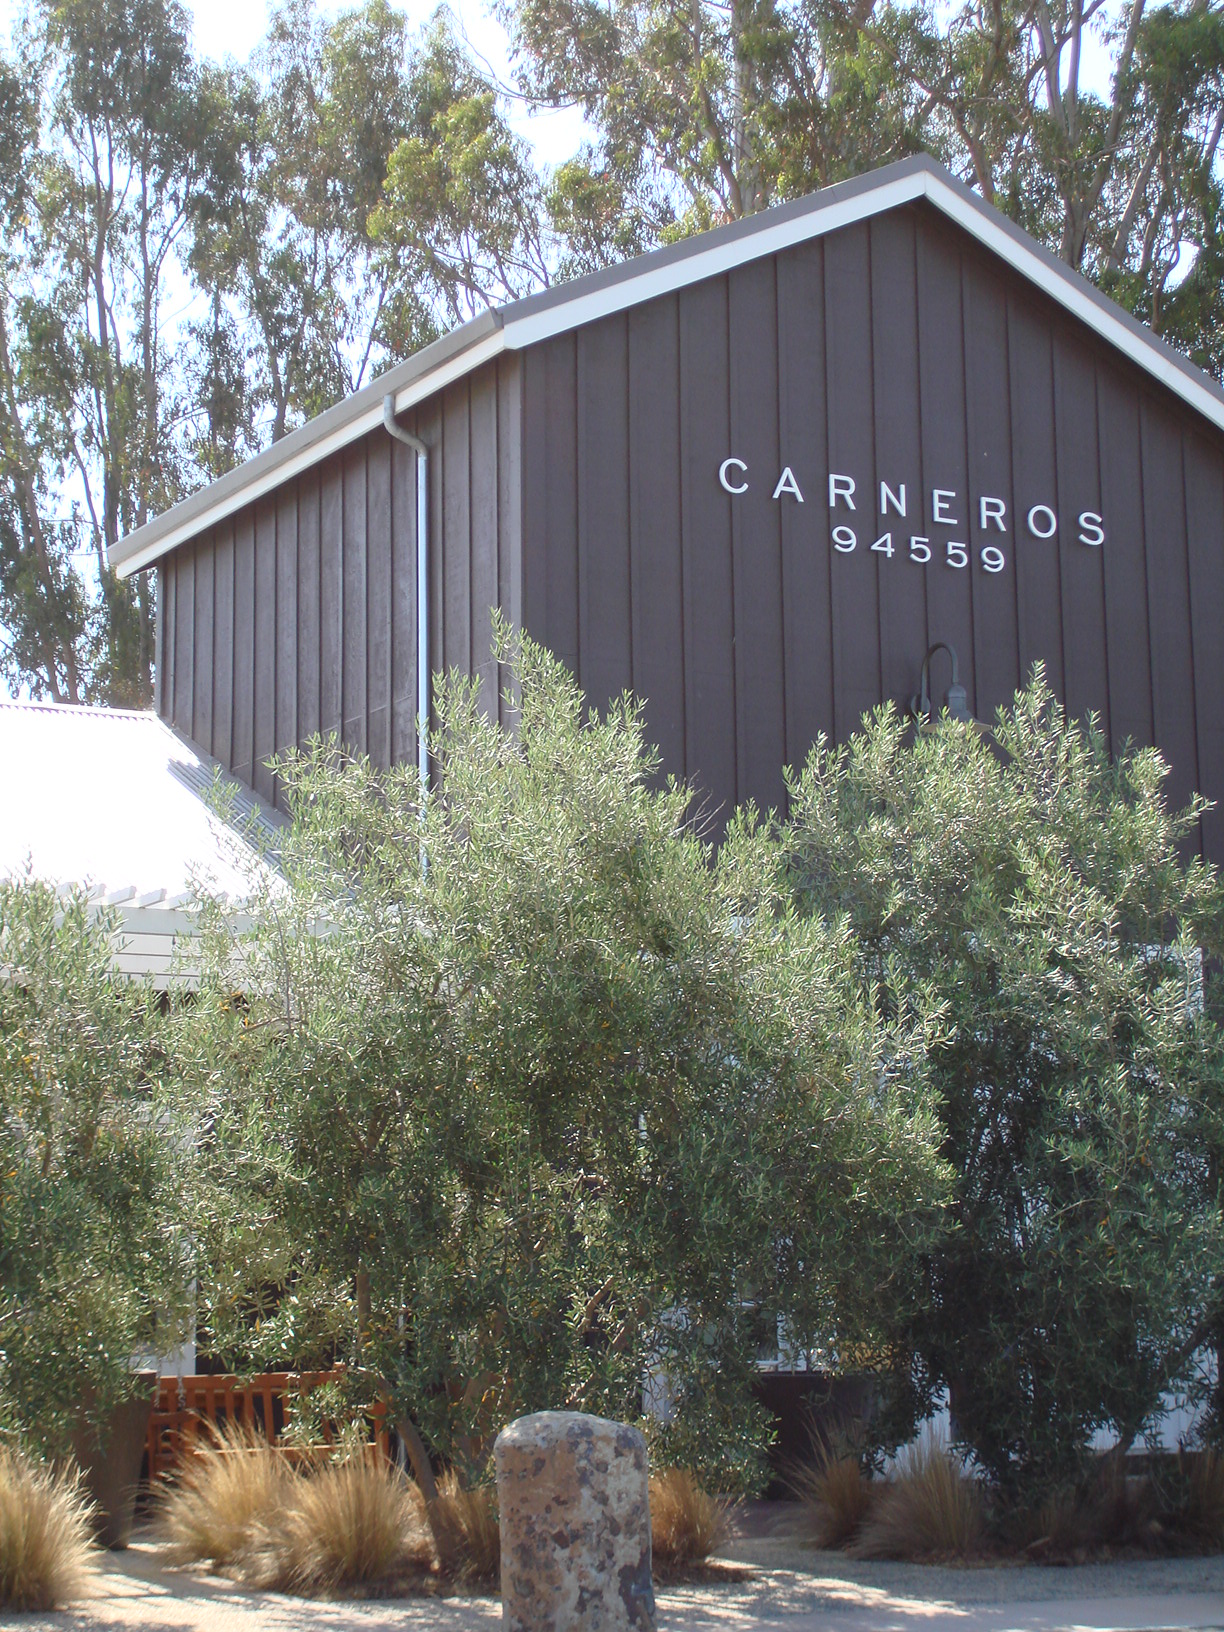 Caneros Inn